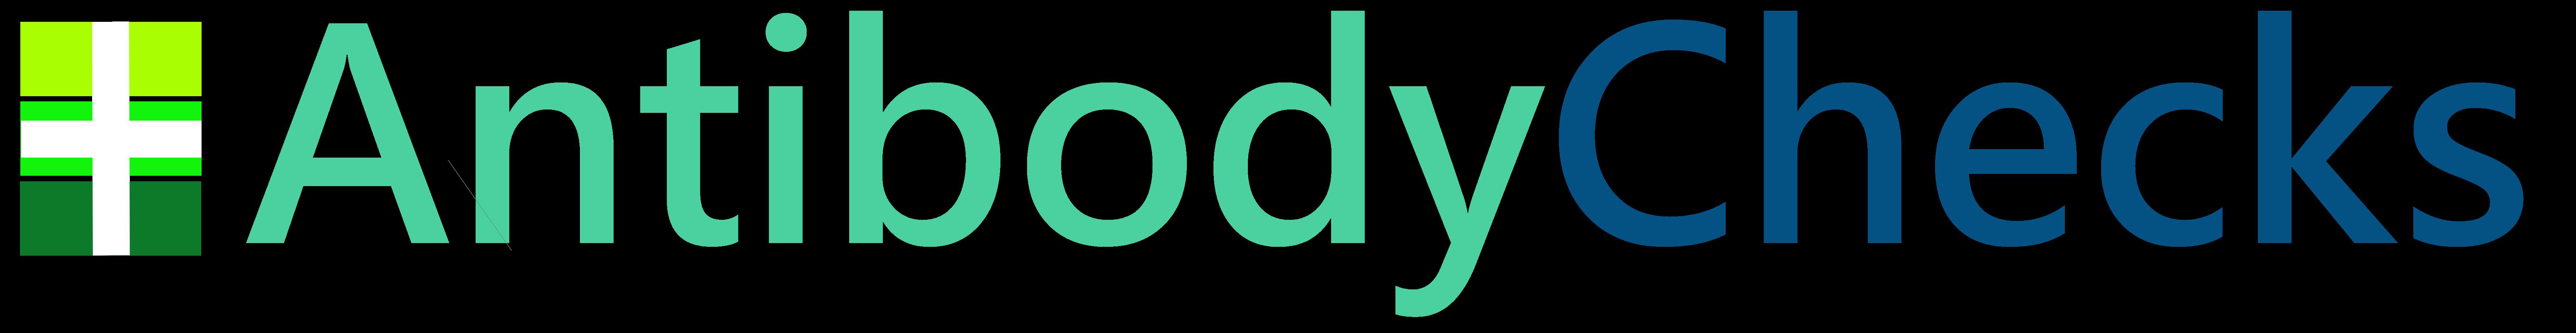 AntibodyChecks - 5-10% Fee On Lifetime Sales for COVID-19 Testing Kits